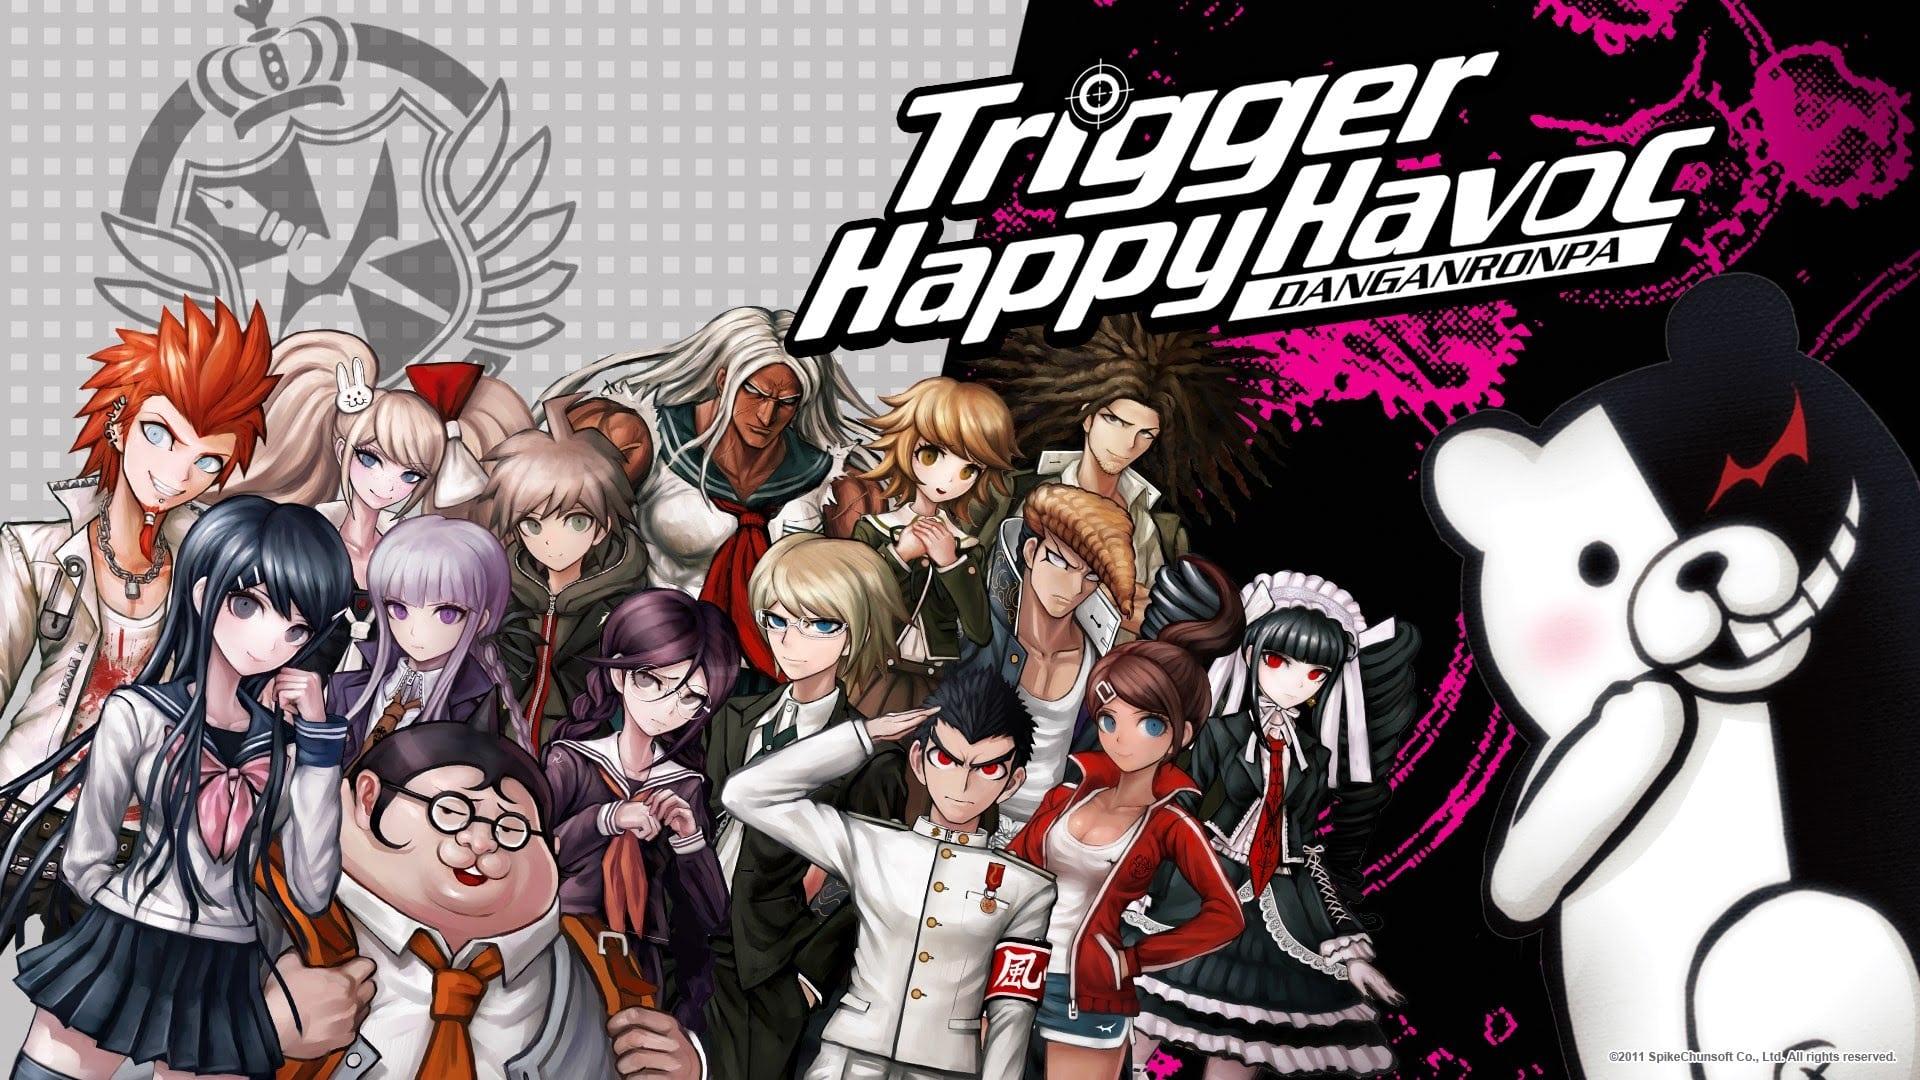 Danganronpa: Trigger Happy Havoc Wallpaper